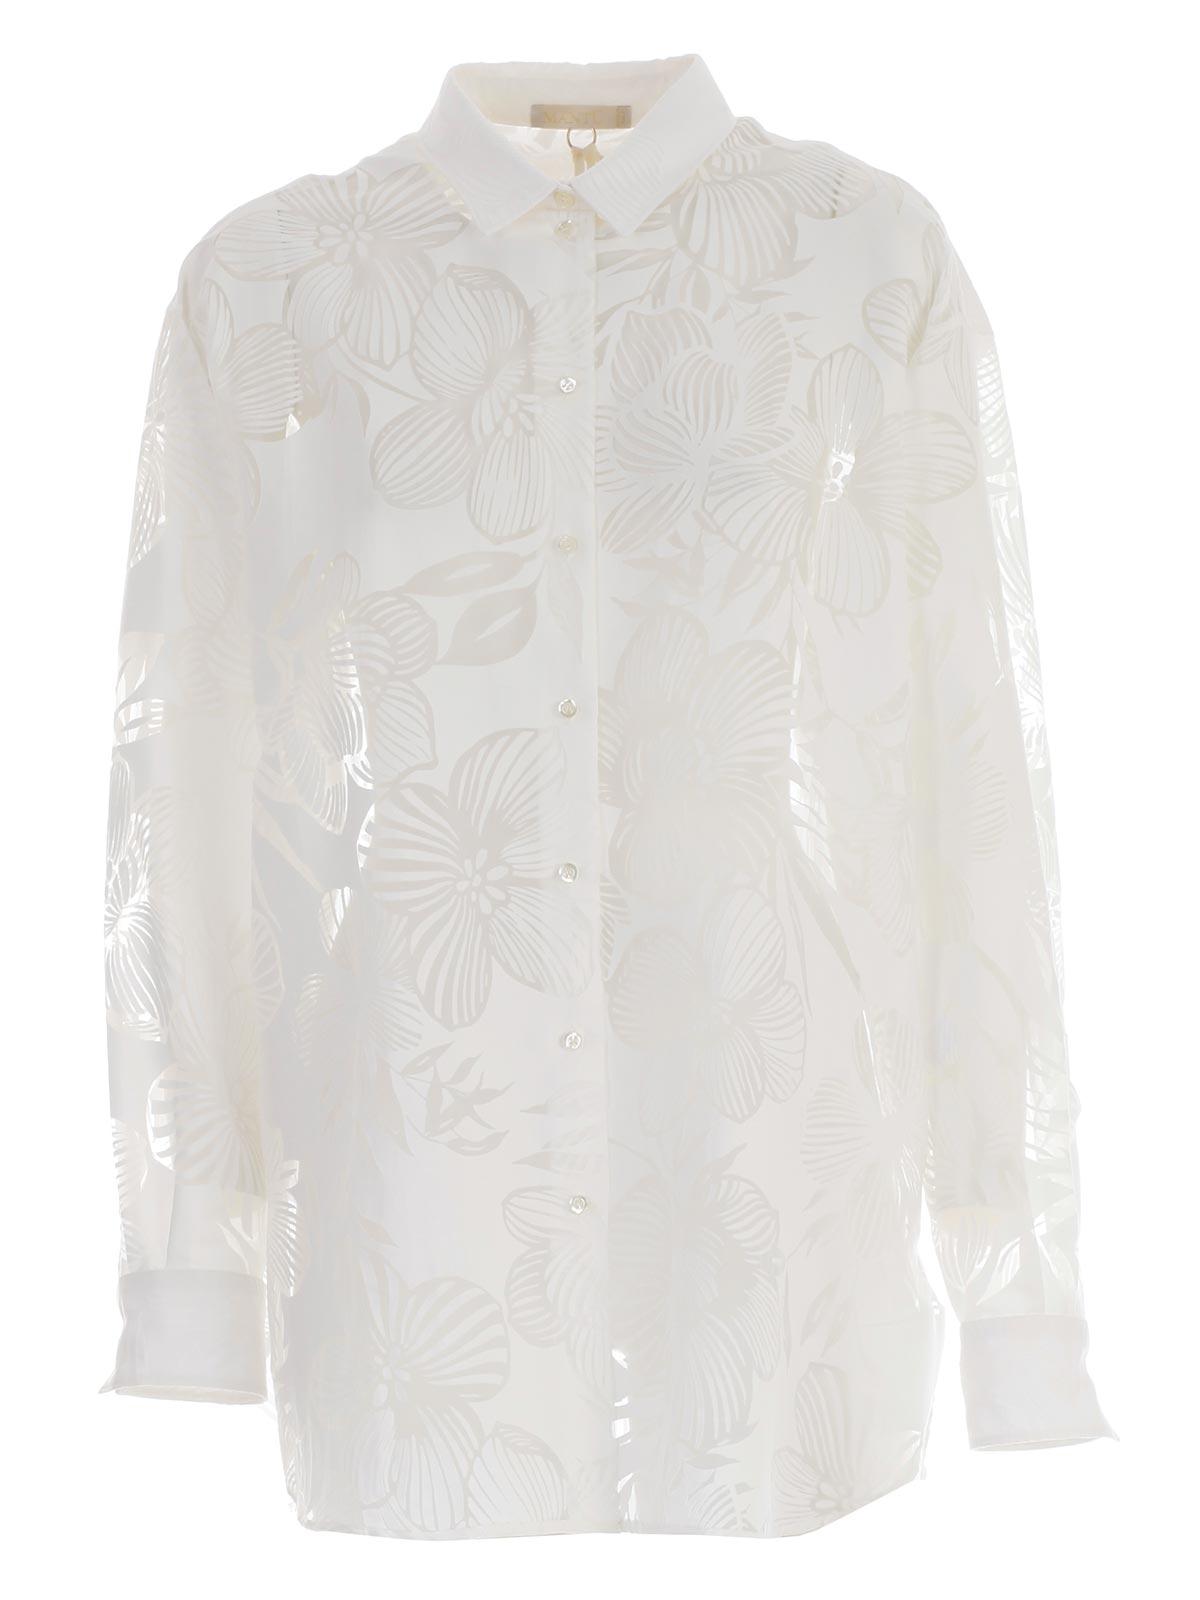 Mantu Shirts Ag1055 G39 101 White Bernardelli Store